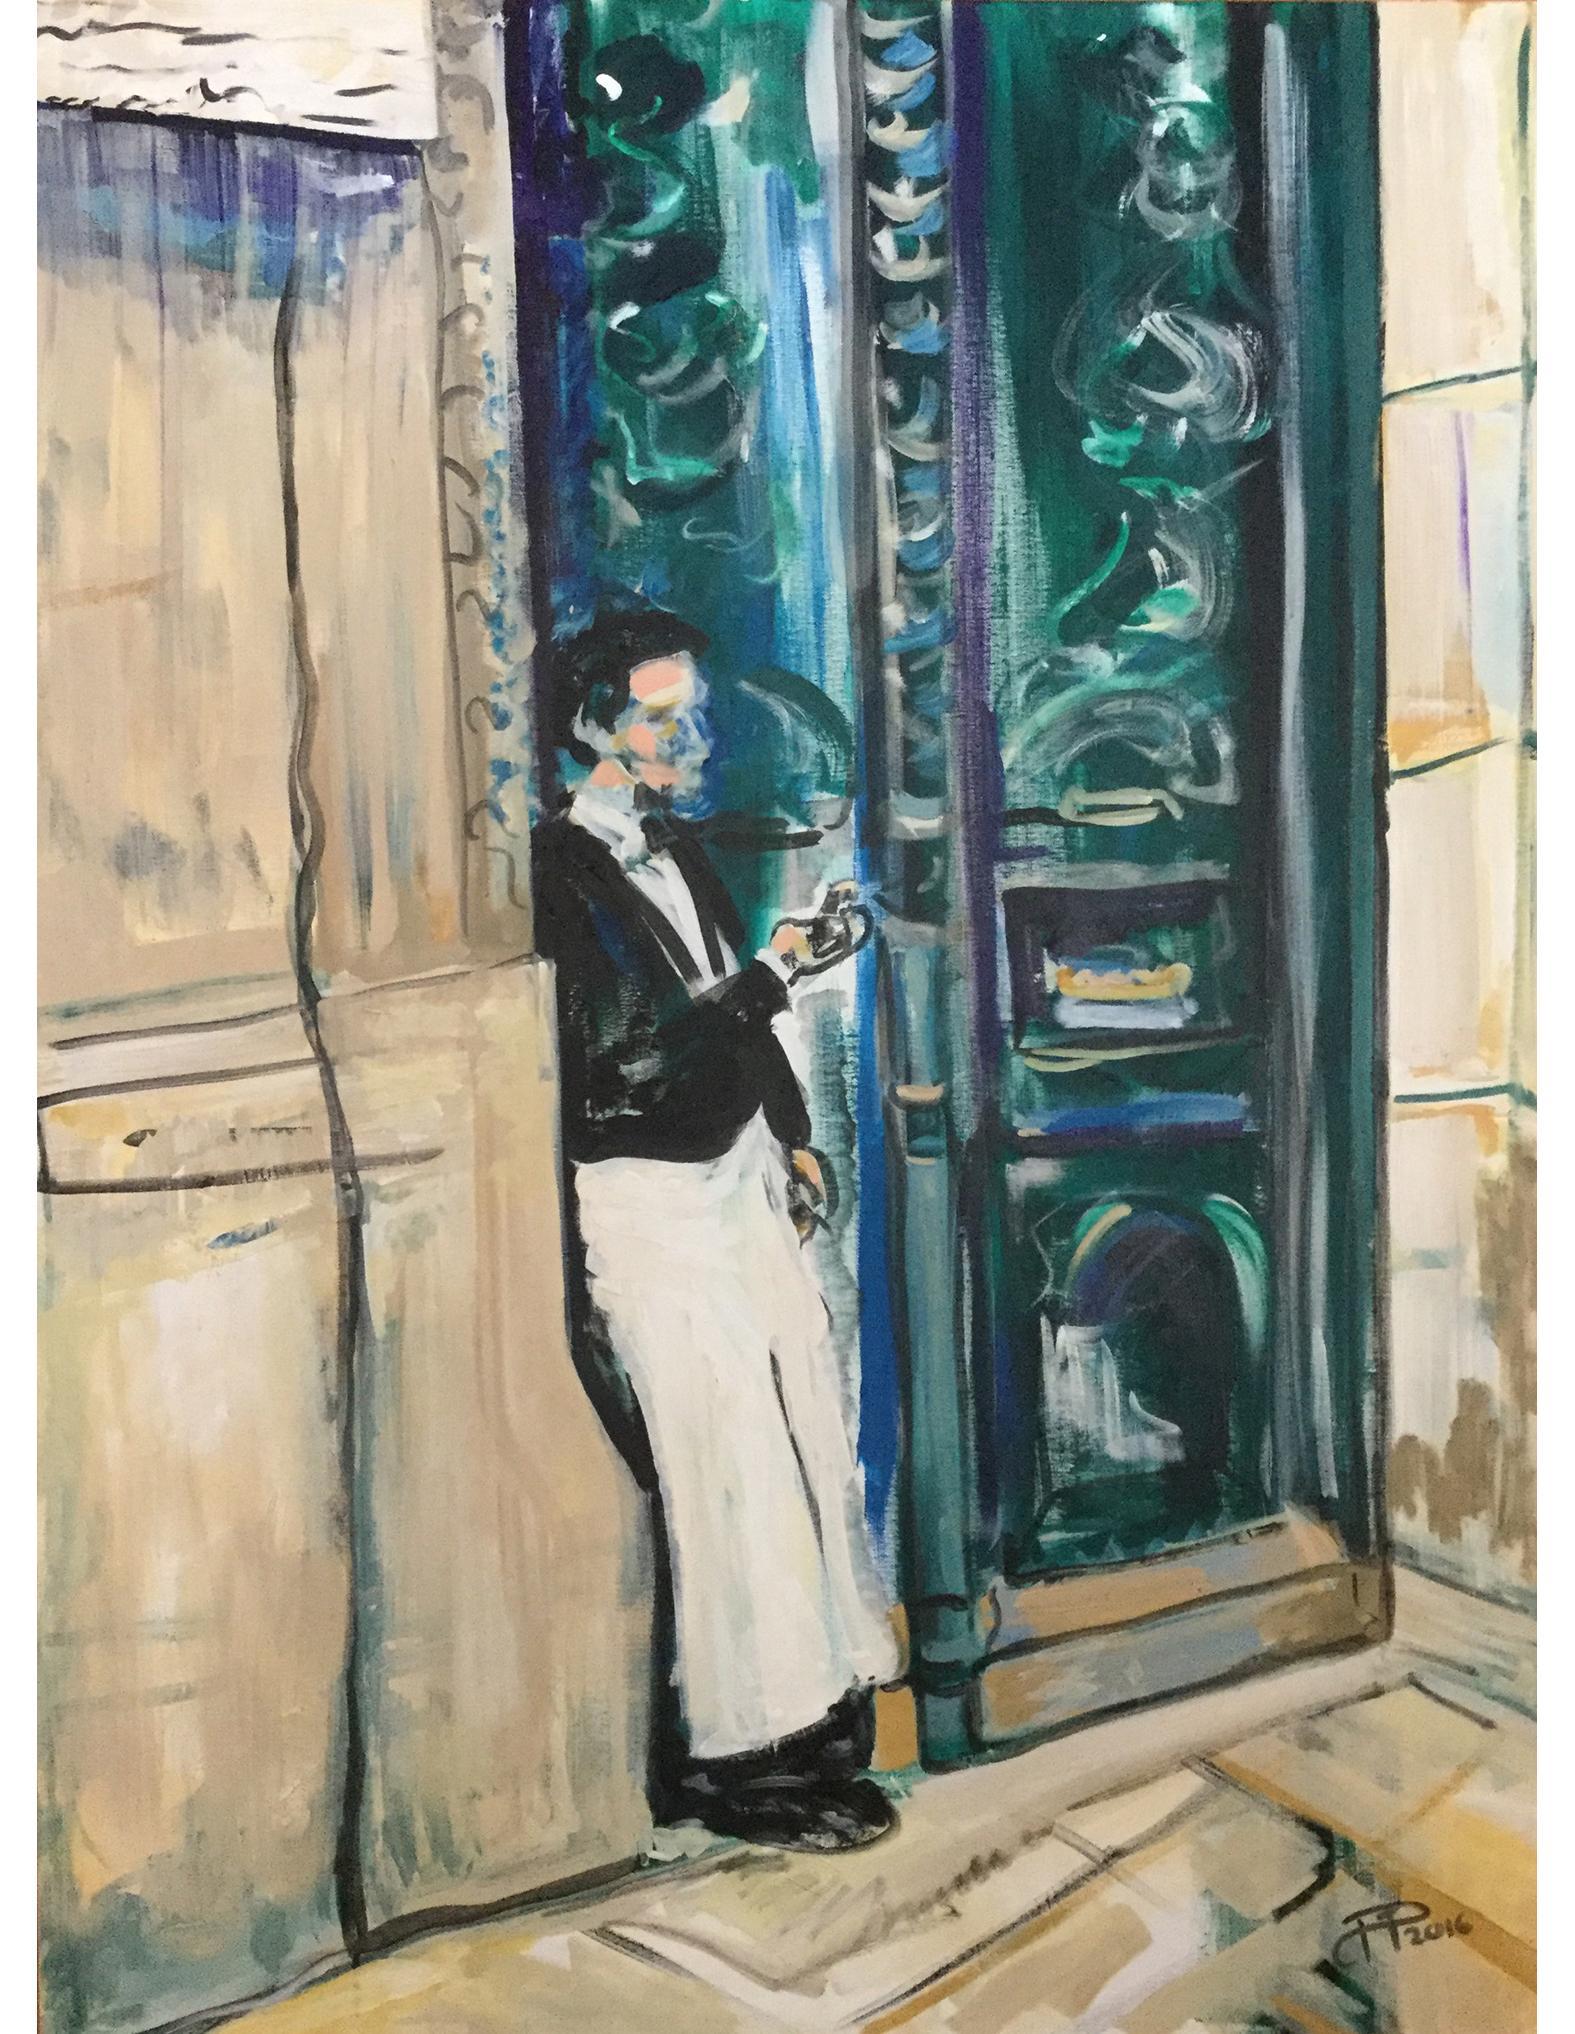 Parisian Waiter on break 2016.jpg